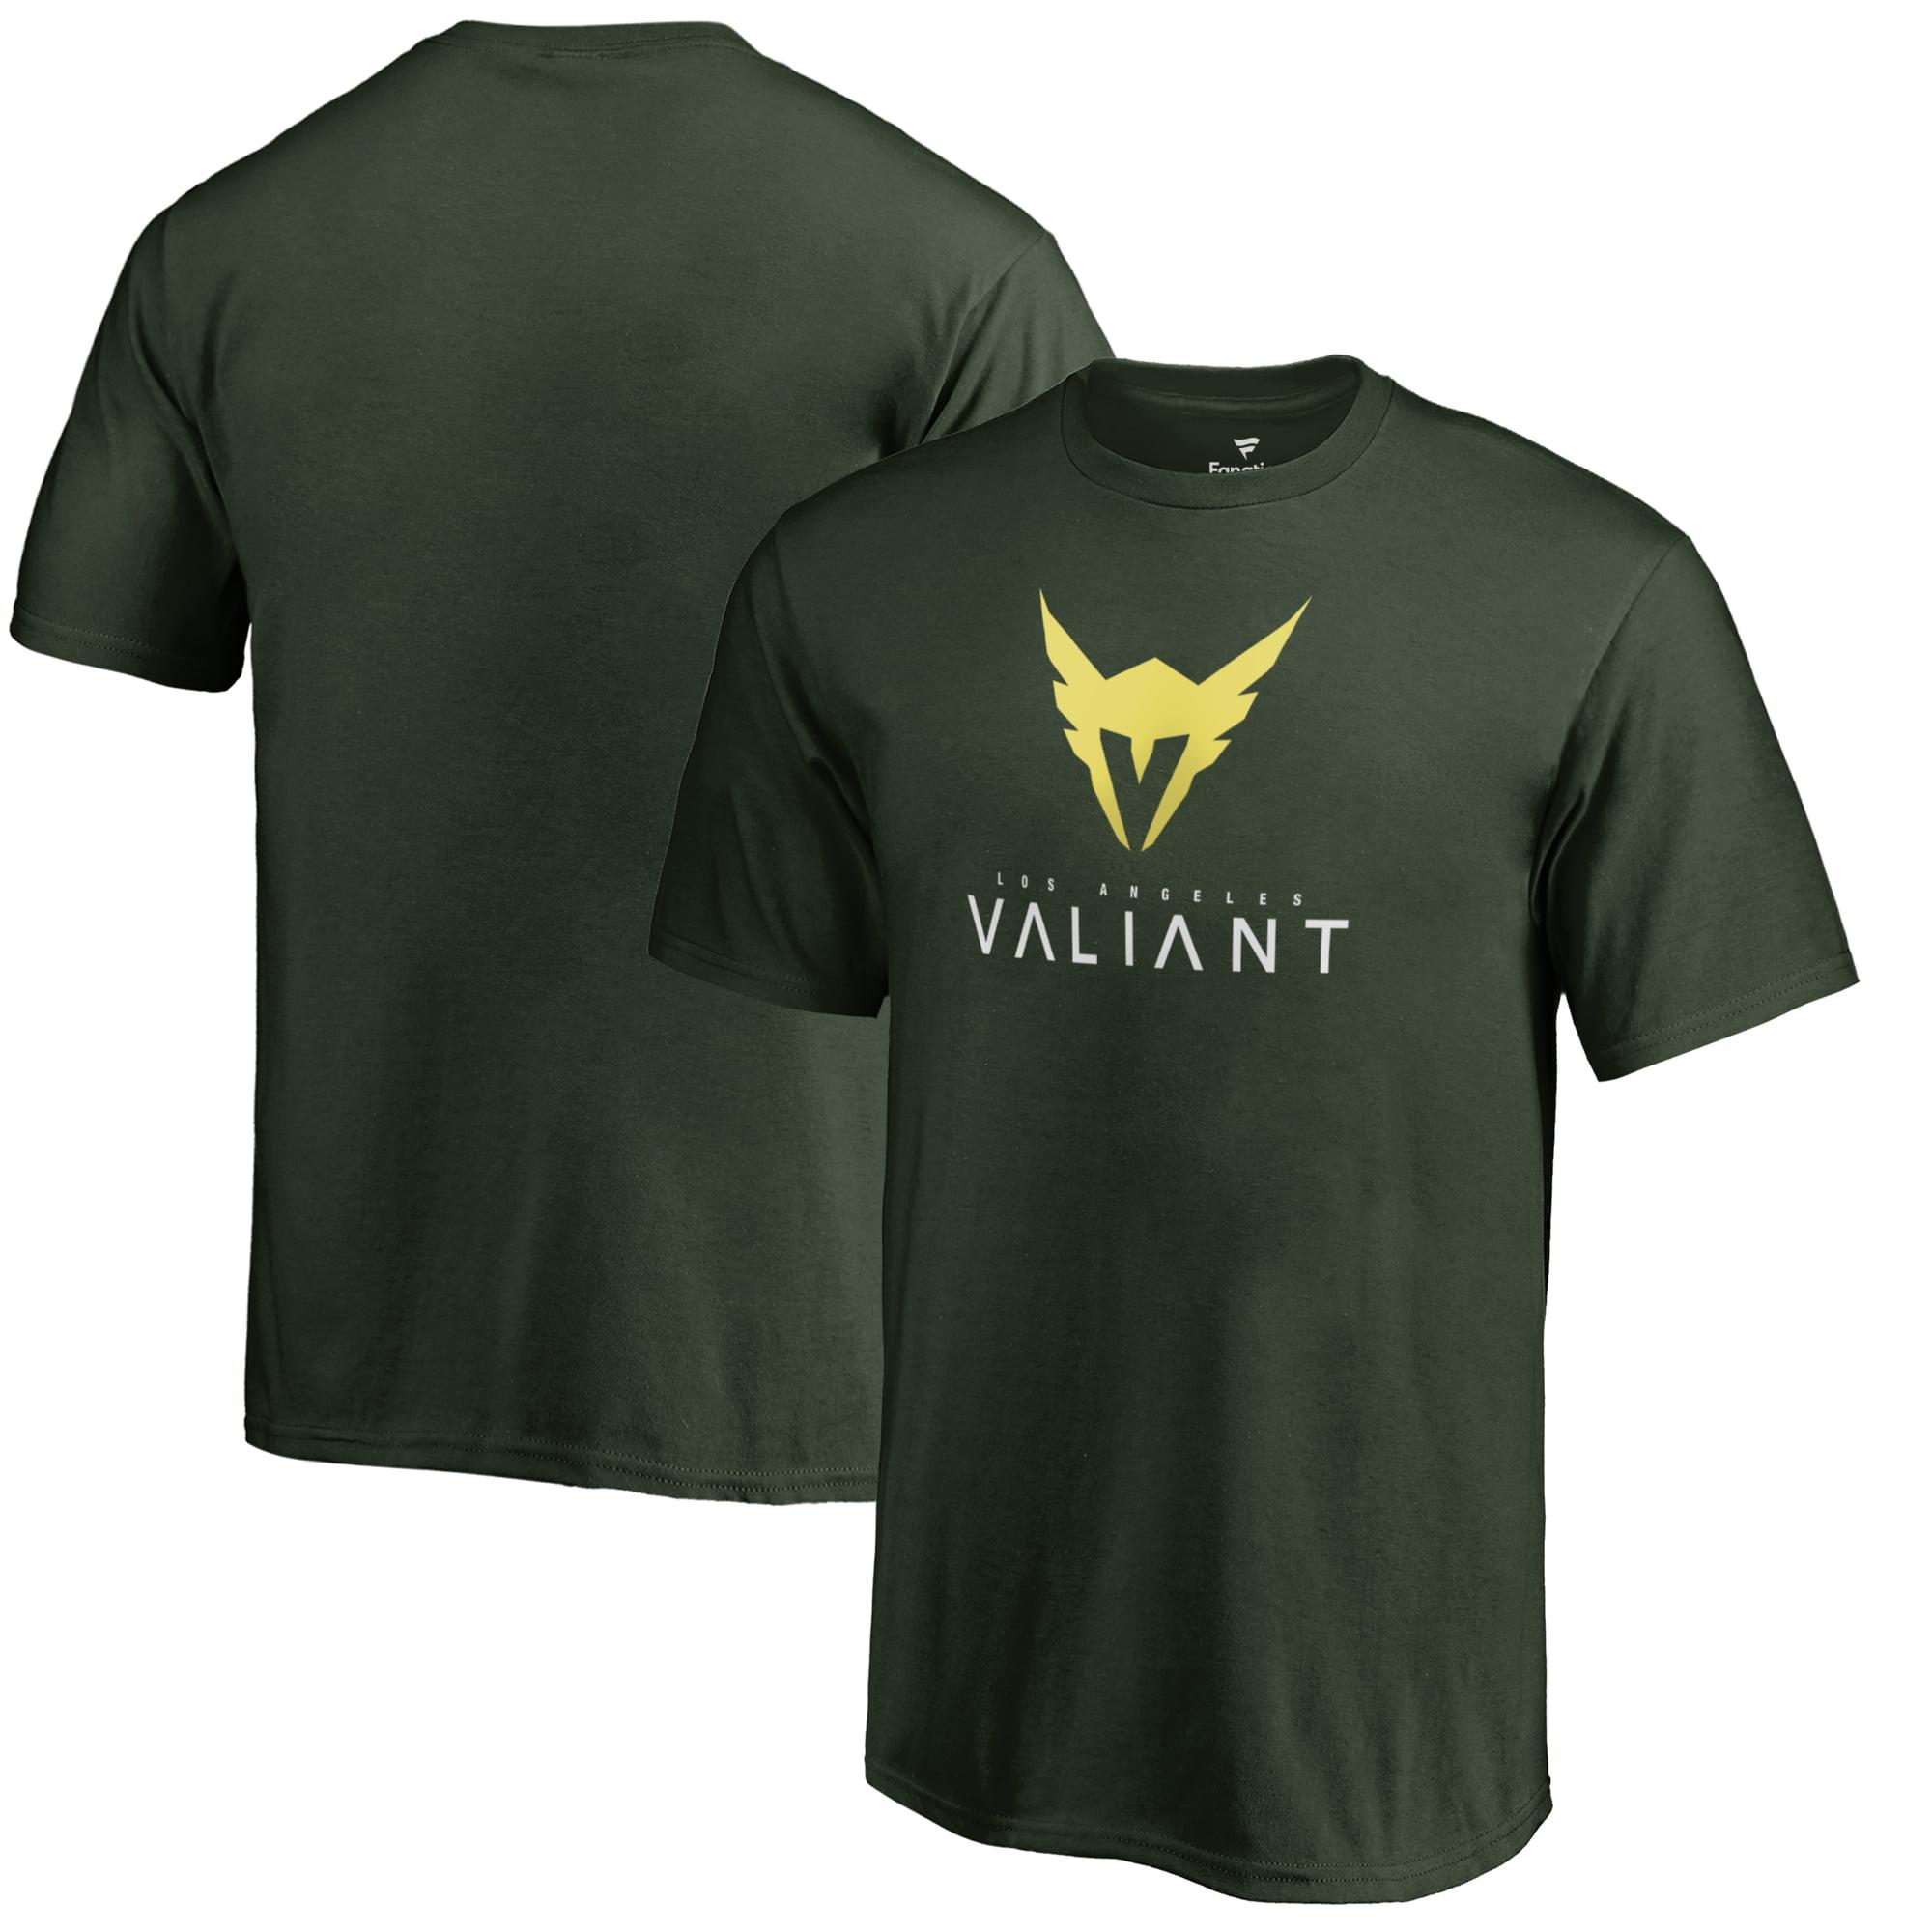 Los Angeles Valiant Fanatics Branded Youth Team Identity T-Shirt - Green